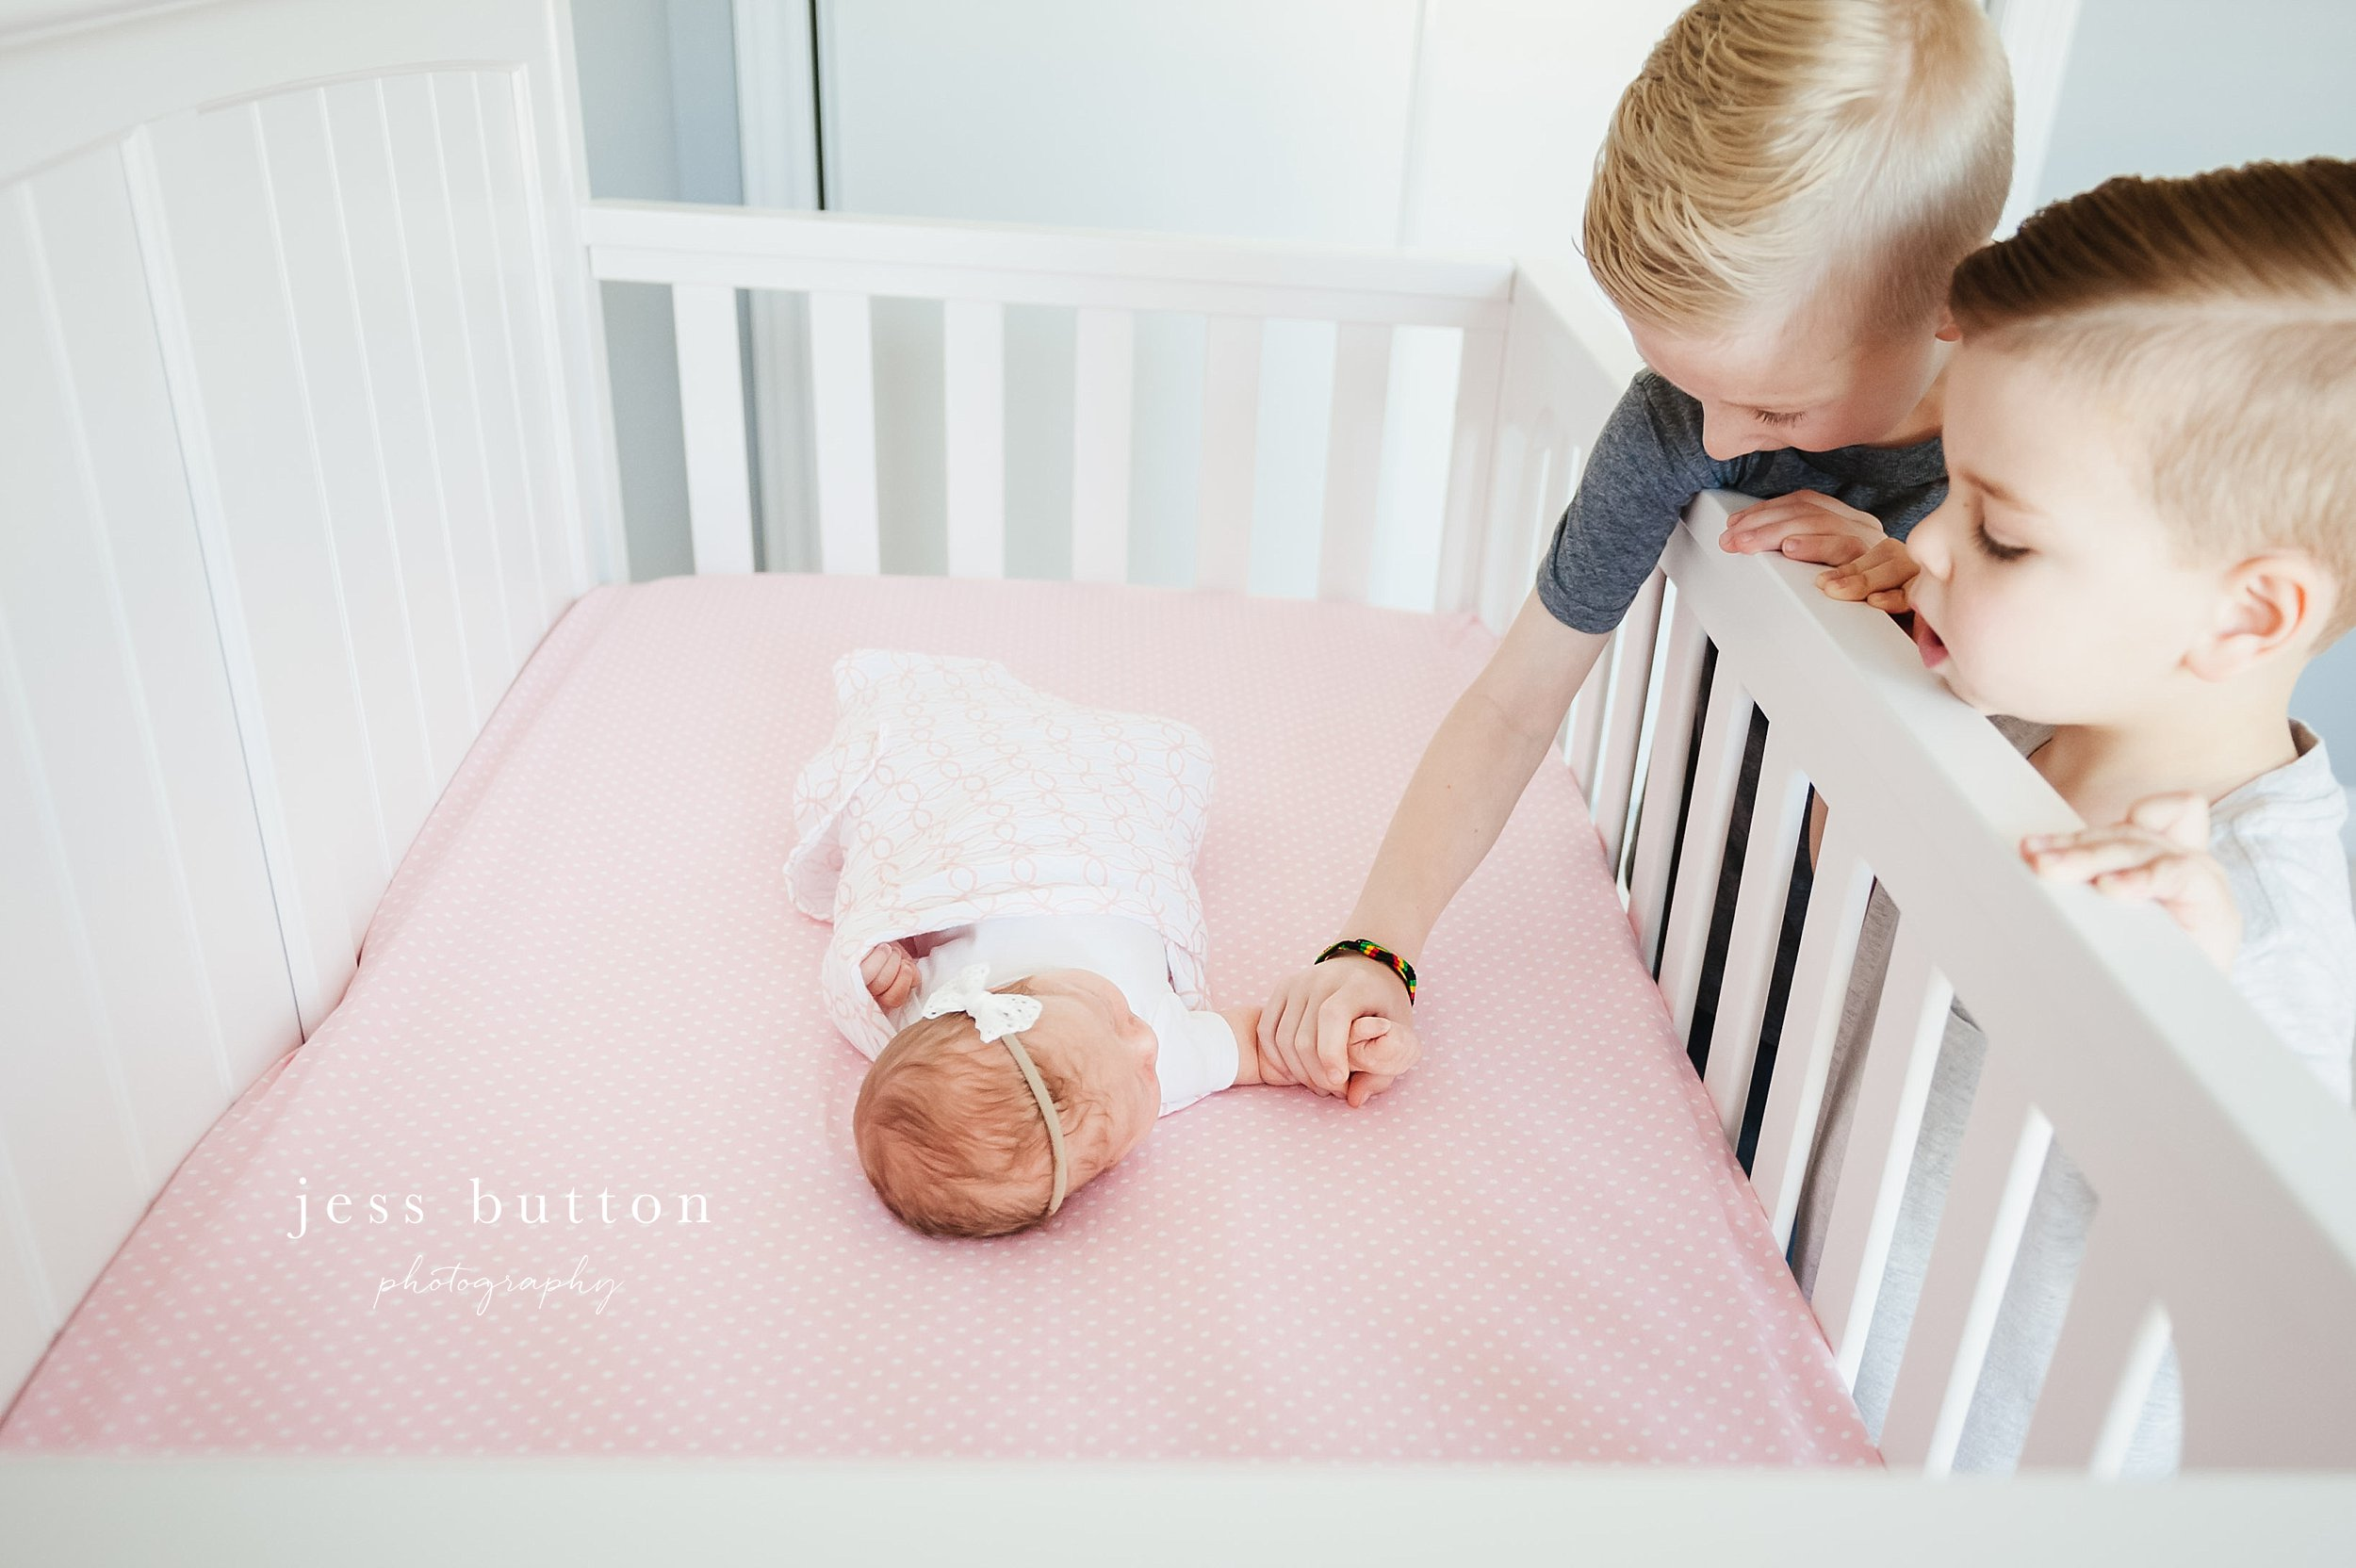 siblings in baby room reaching into crib